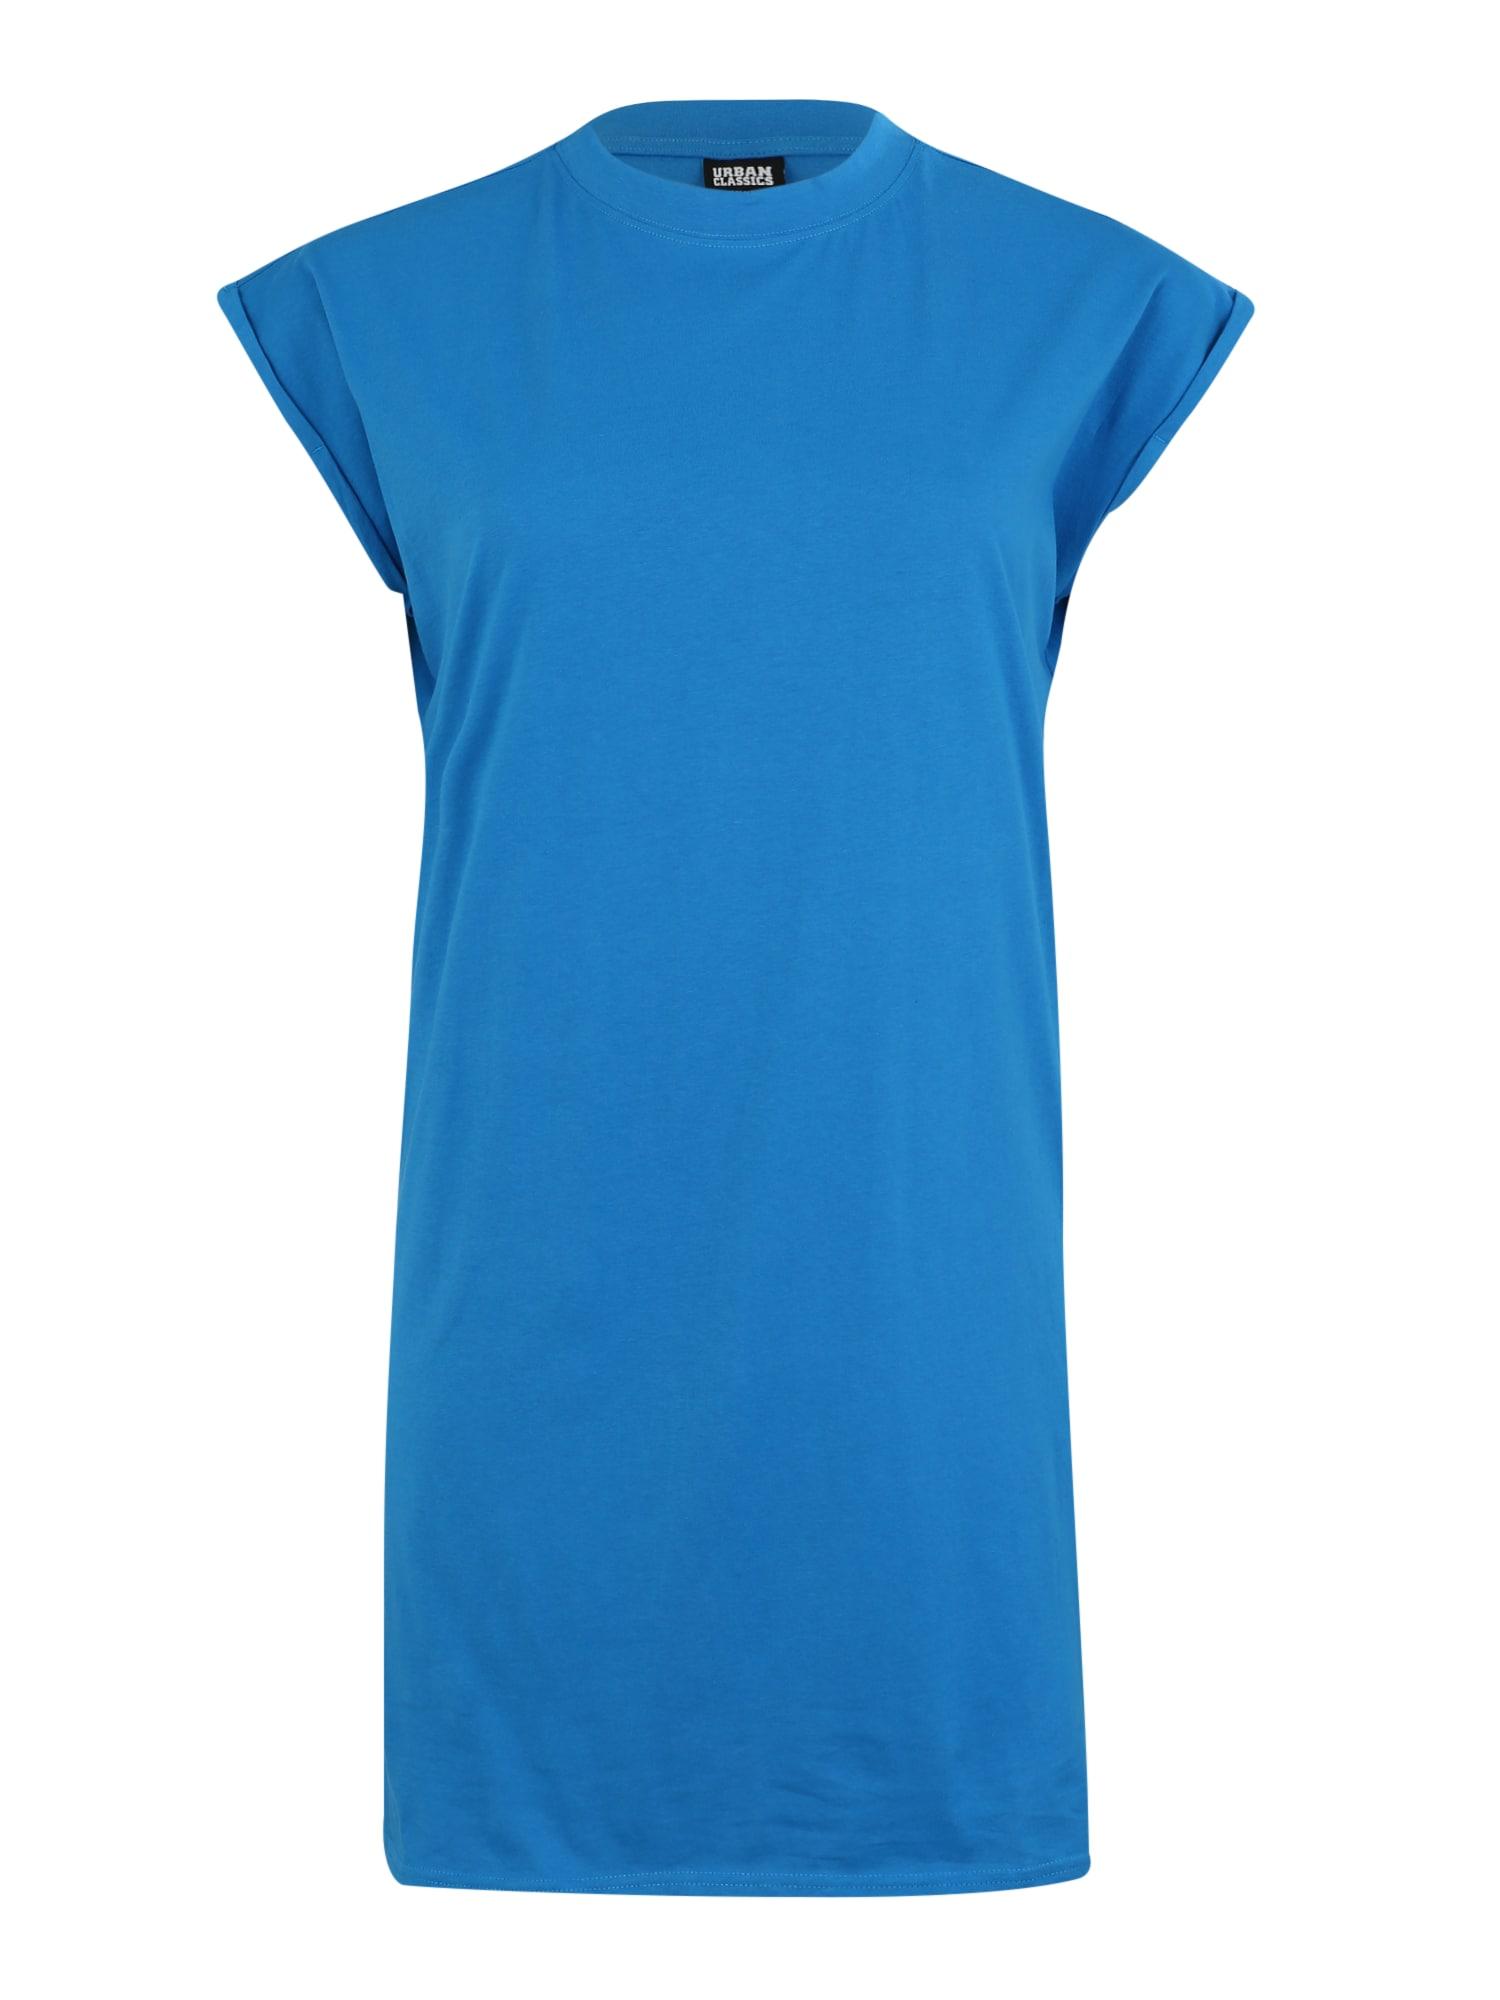 Urban Classics Curvy Suknelė 'Turtle' mėlyna